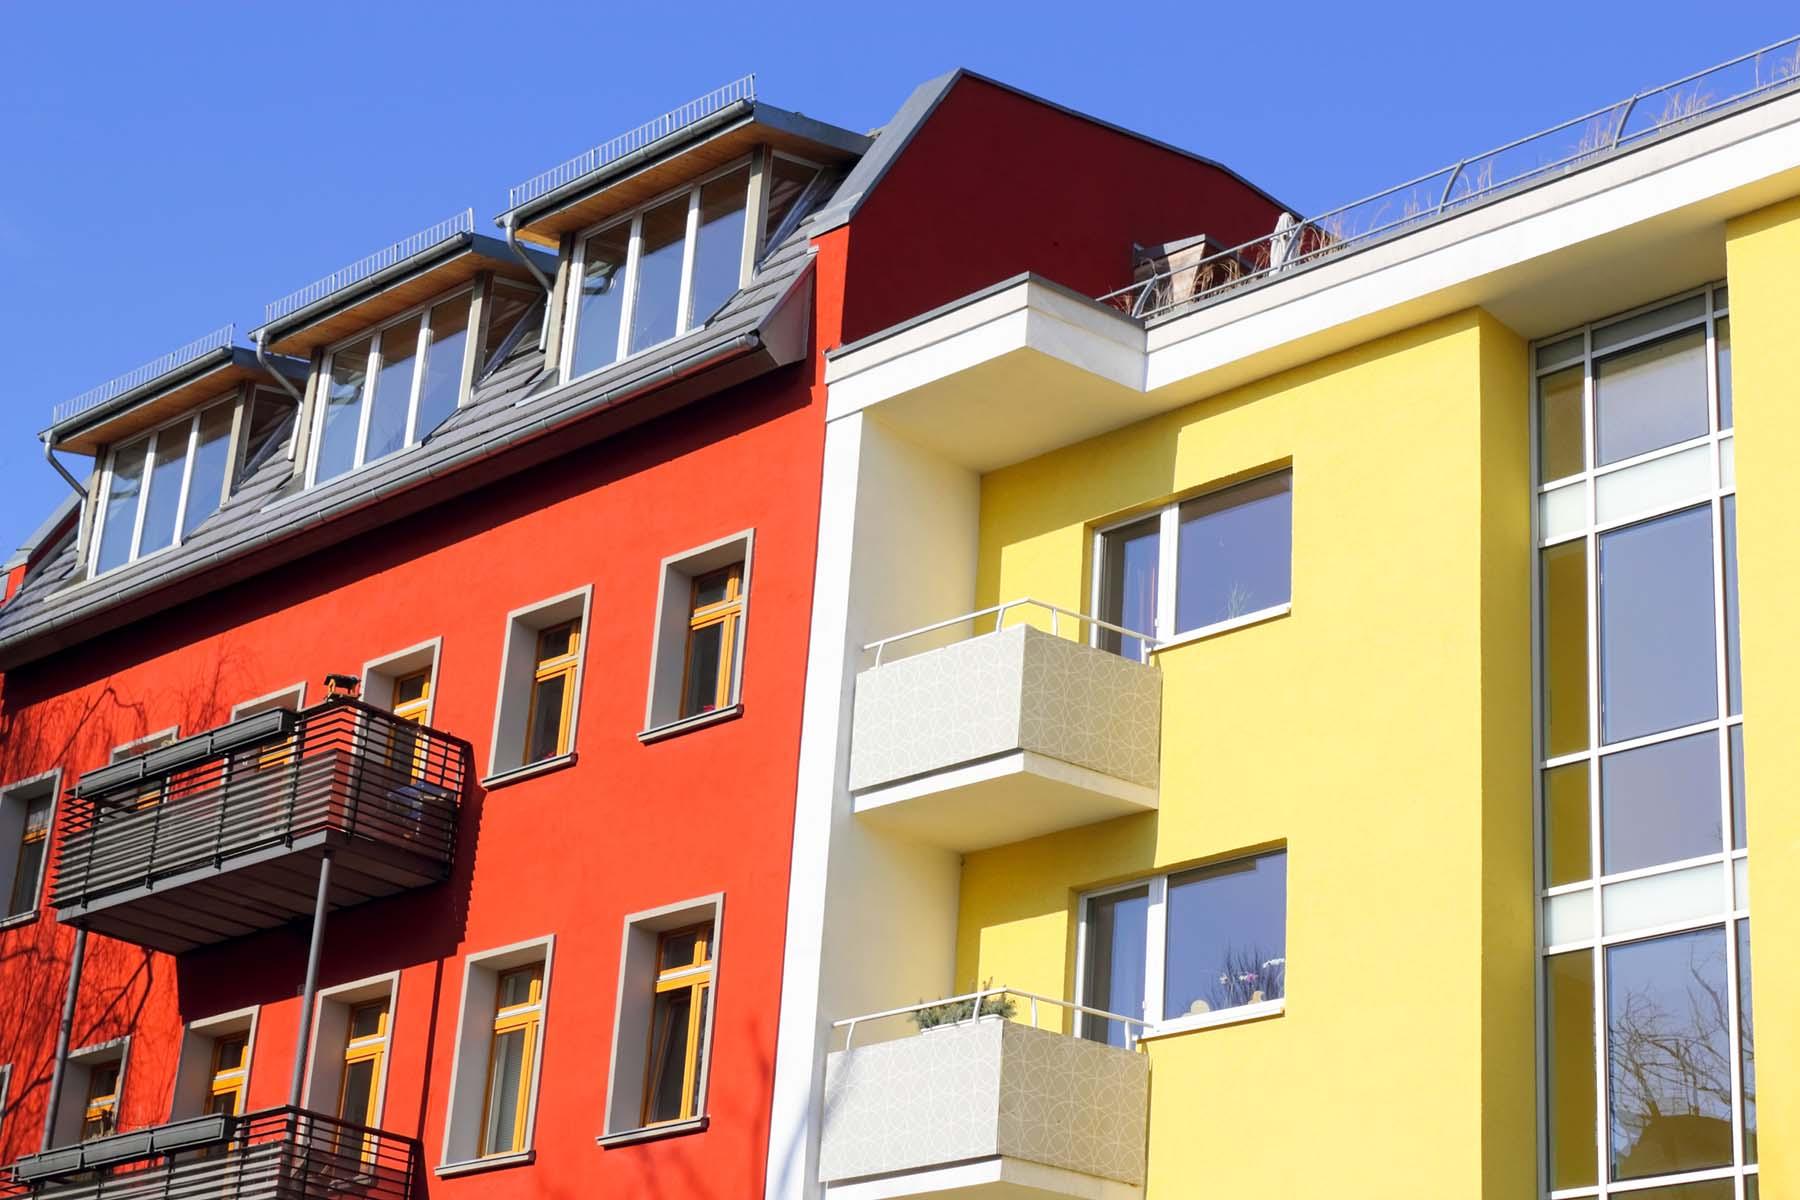 Mietwohnung bremen ungruh immobilien bremen for Immobilien mietwohnung